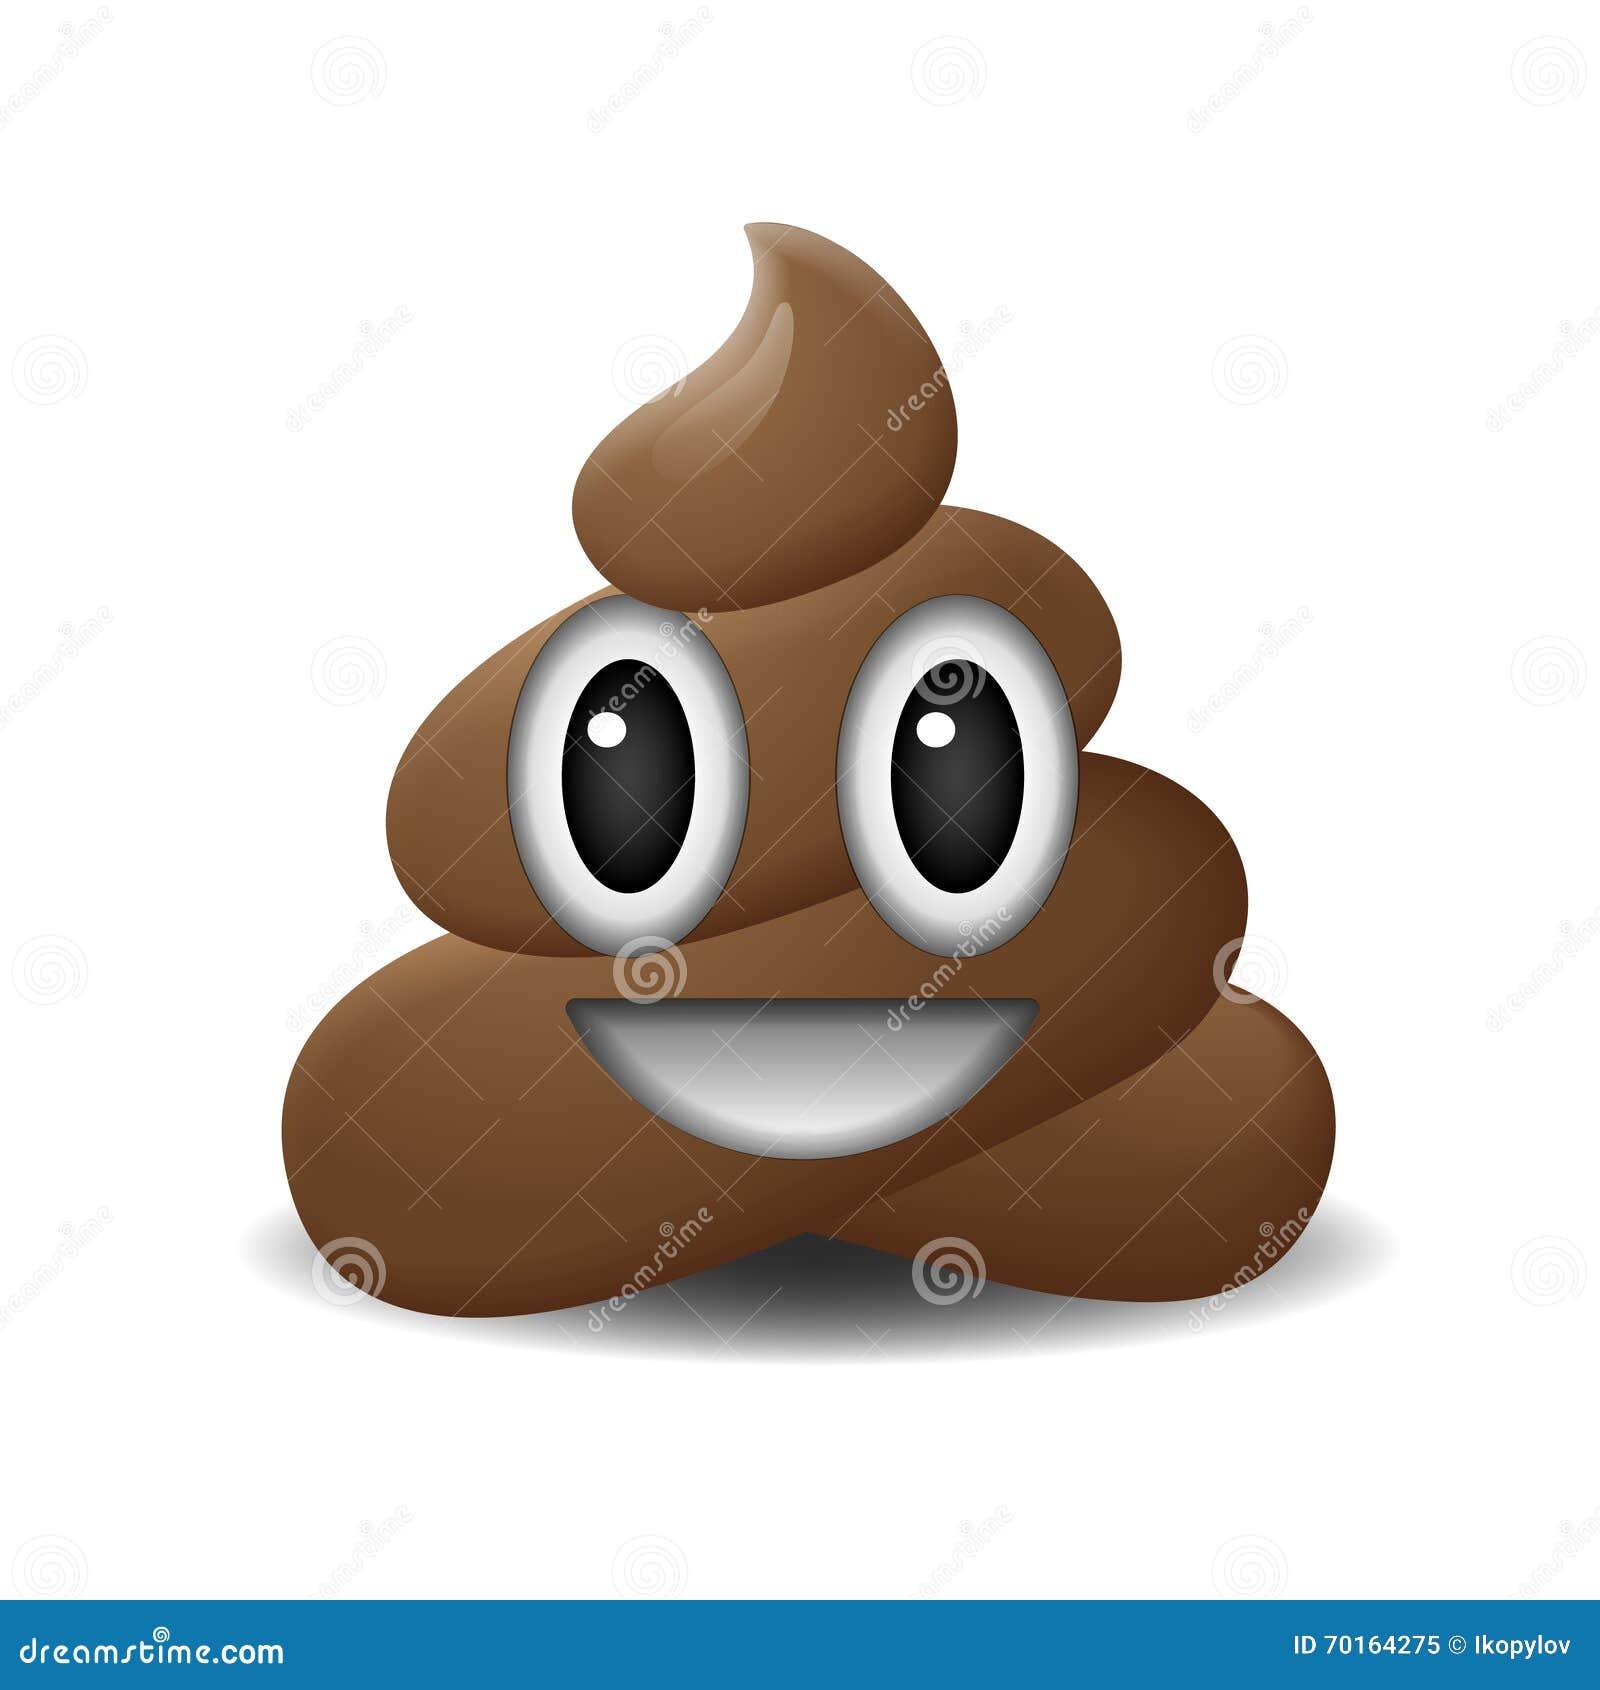 bullshit cartoons  illustrations   vector stock images smiling faces clipart smiling faces clipart images